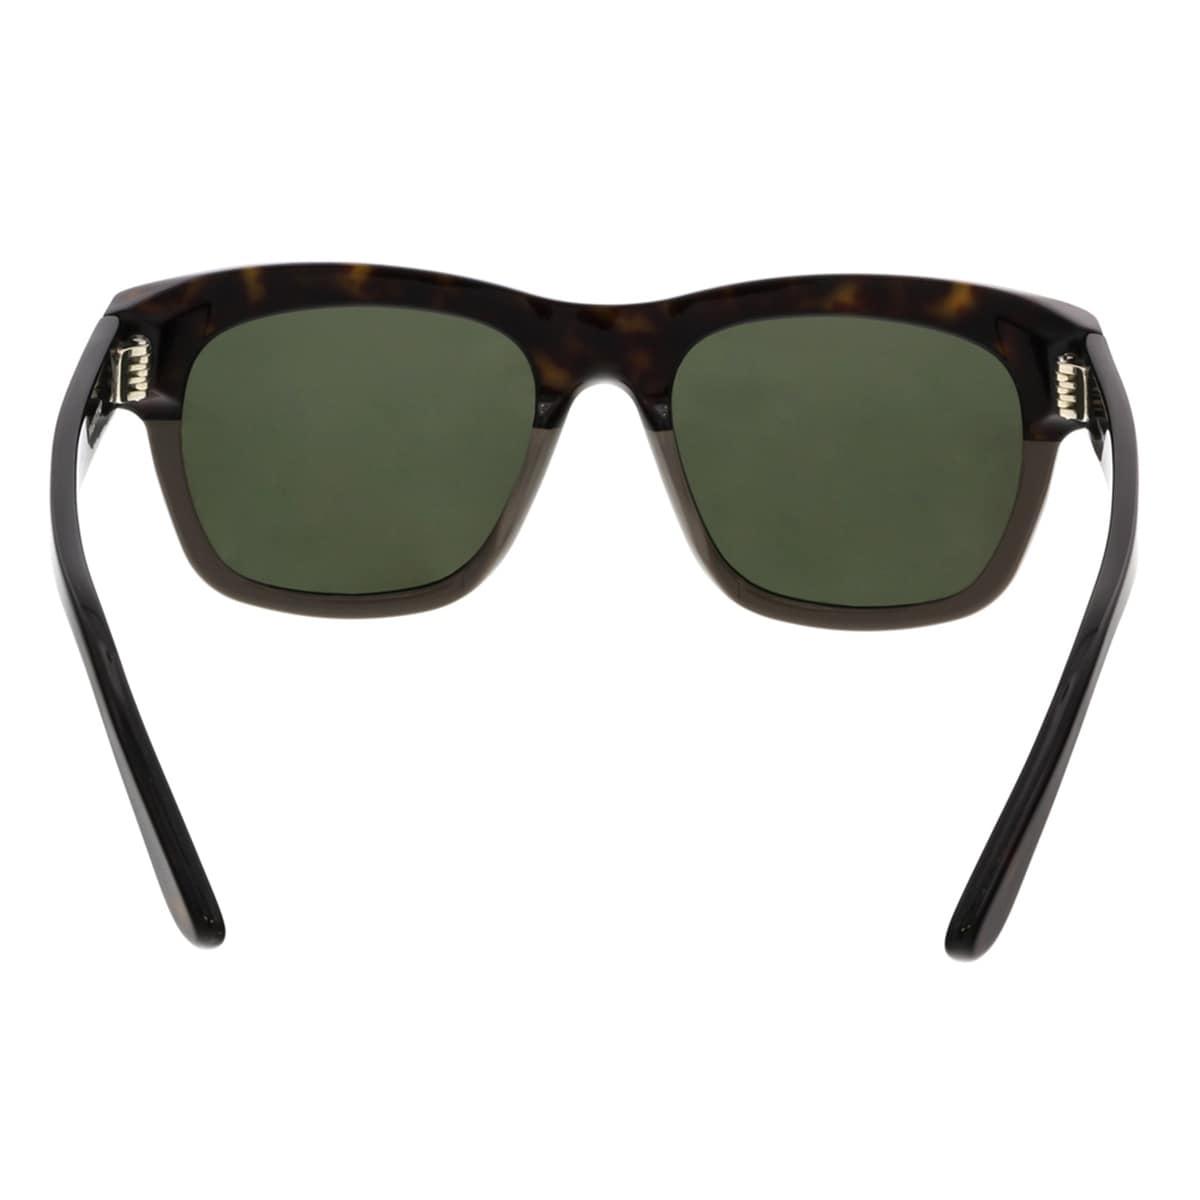 1d2e13051a9 Shop Valentino V703S 245 Dark Havana Wayfarer Sunglasses - 53-19-145 - Free  Shipping Today - Overstock - 14083915